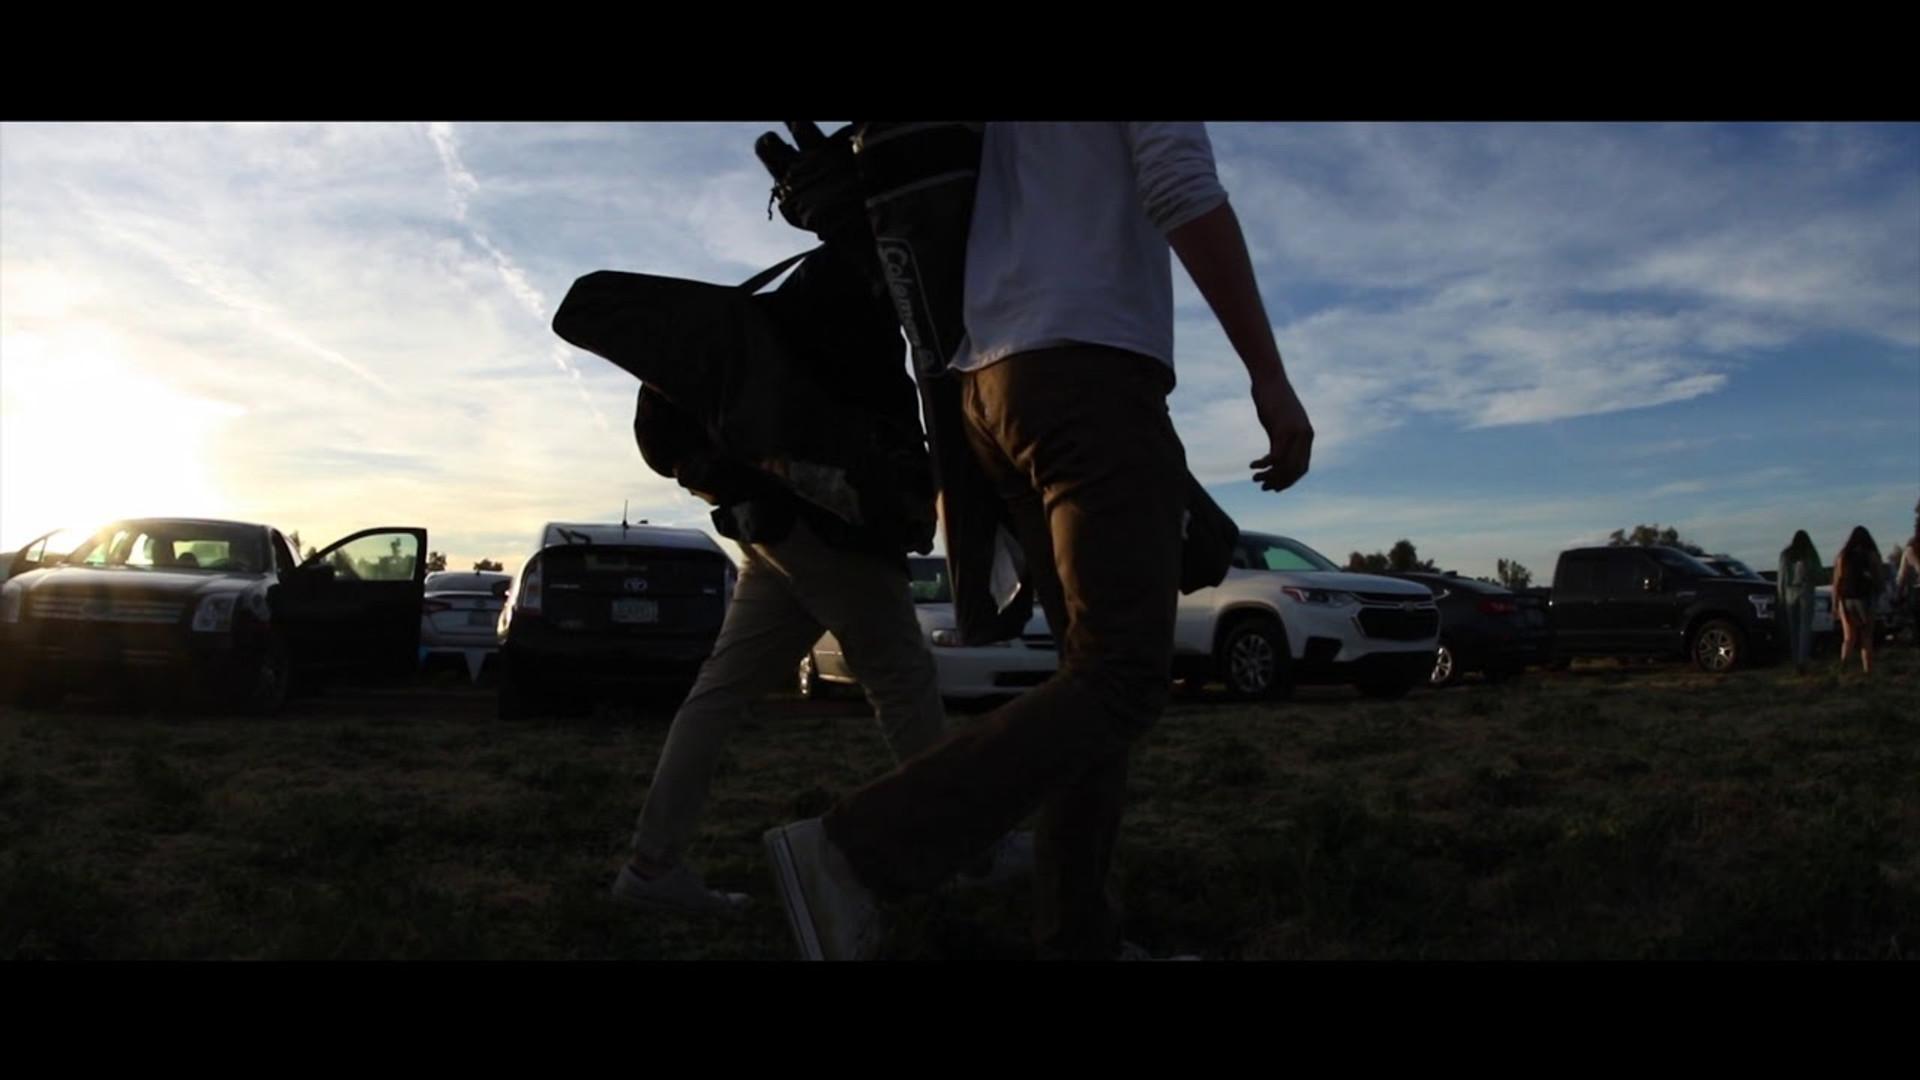 VALLEY OF THE SUN: LANTERN FEST 2018